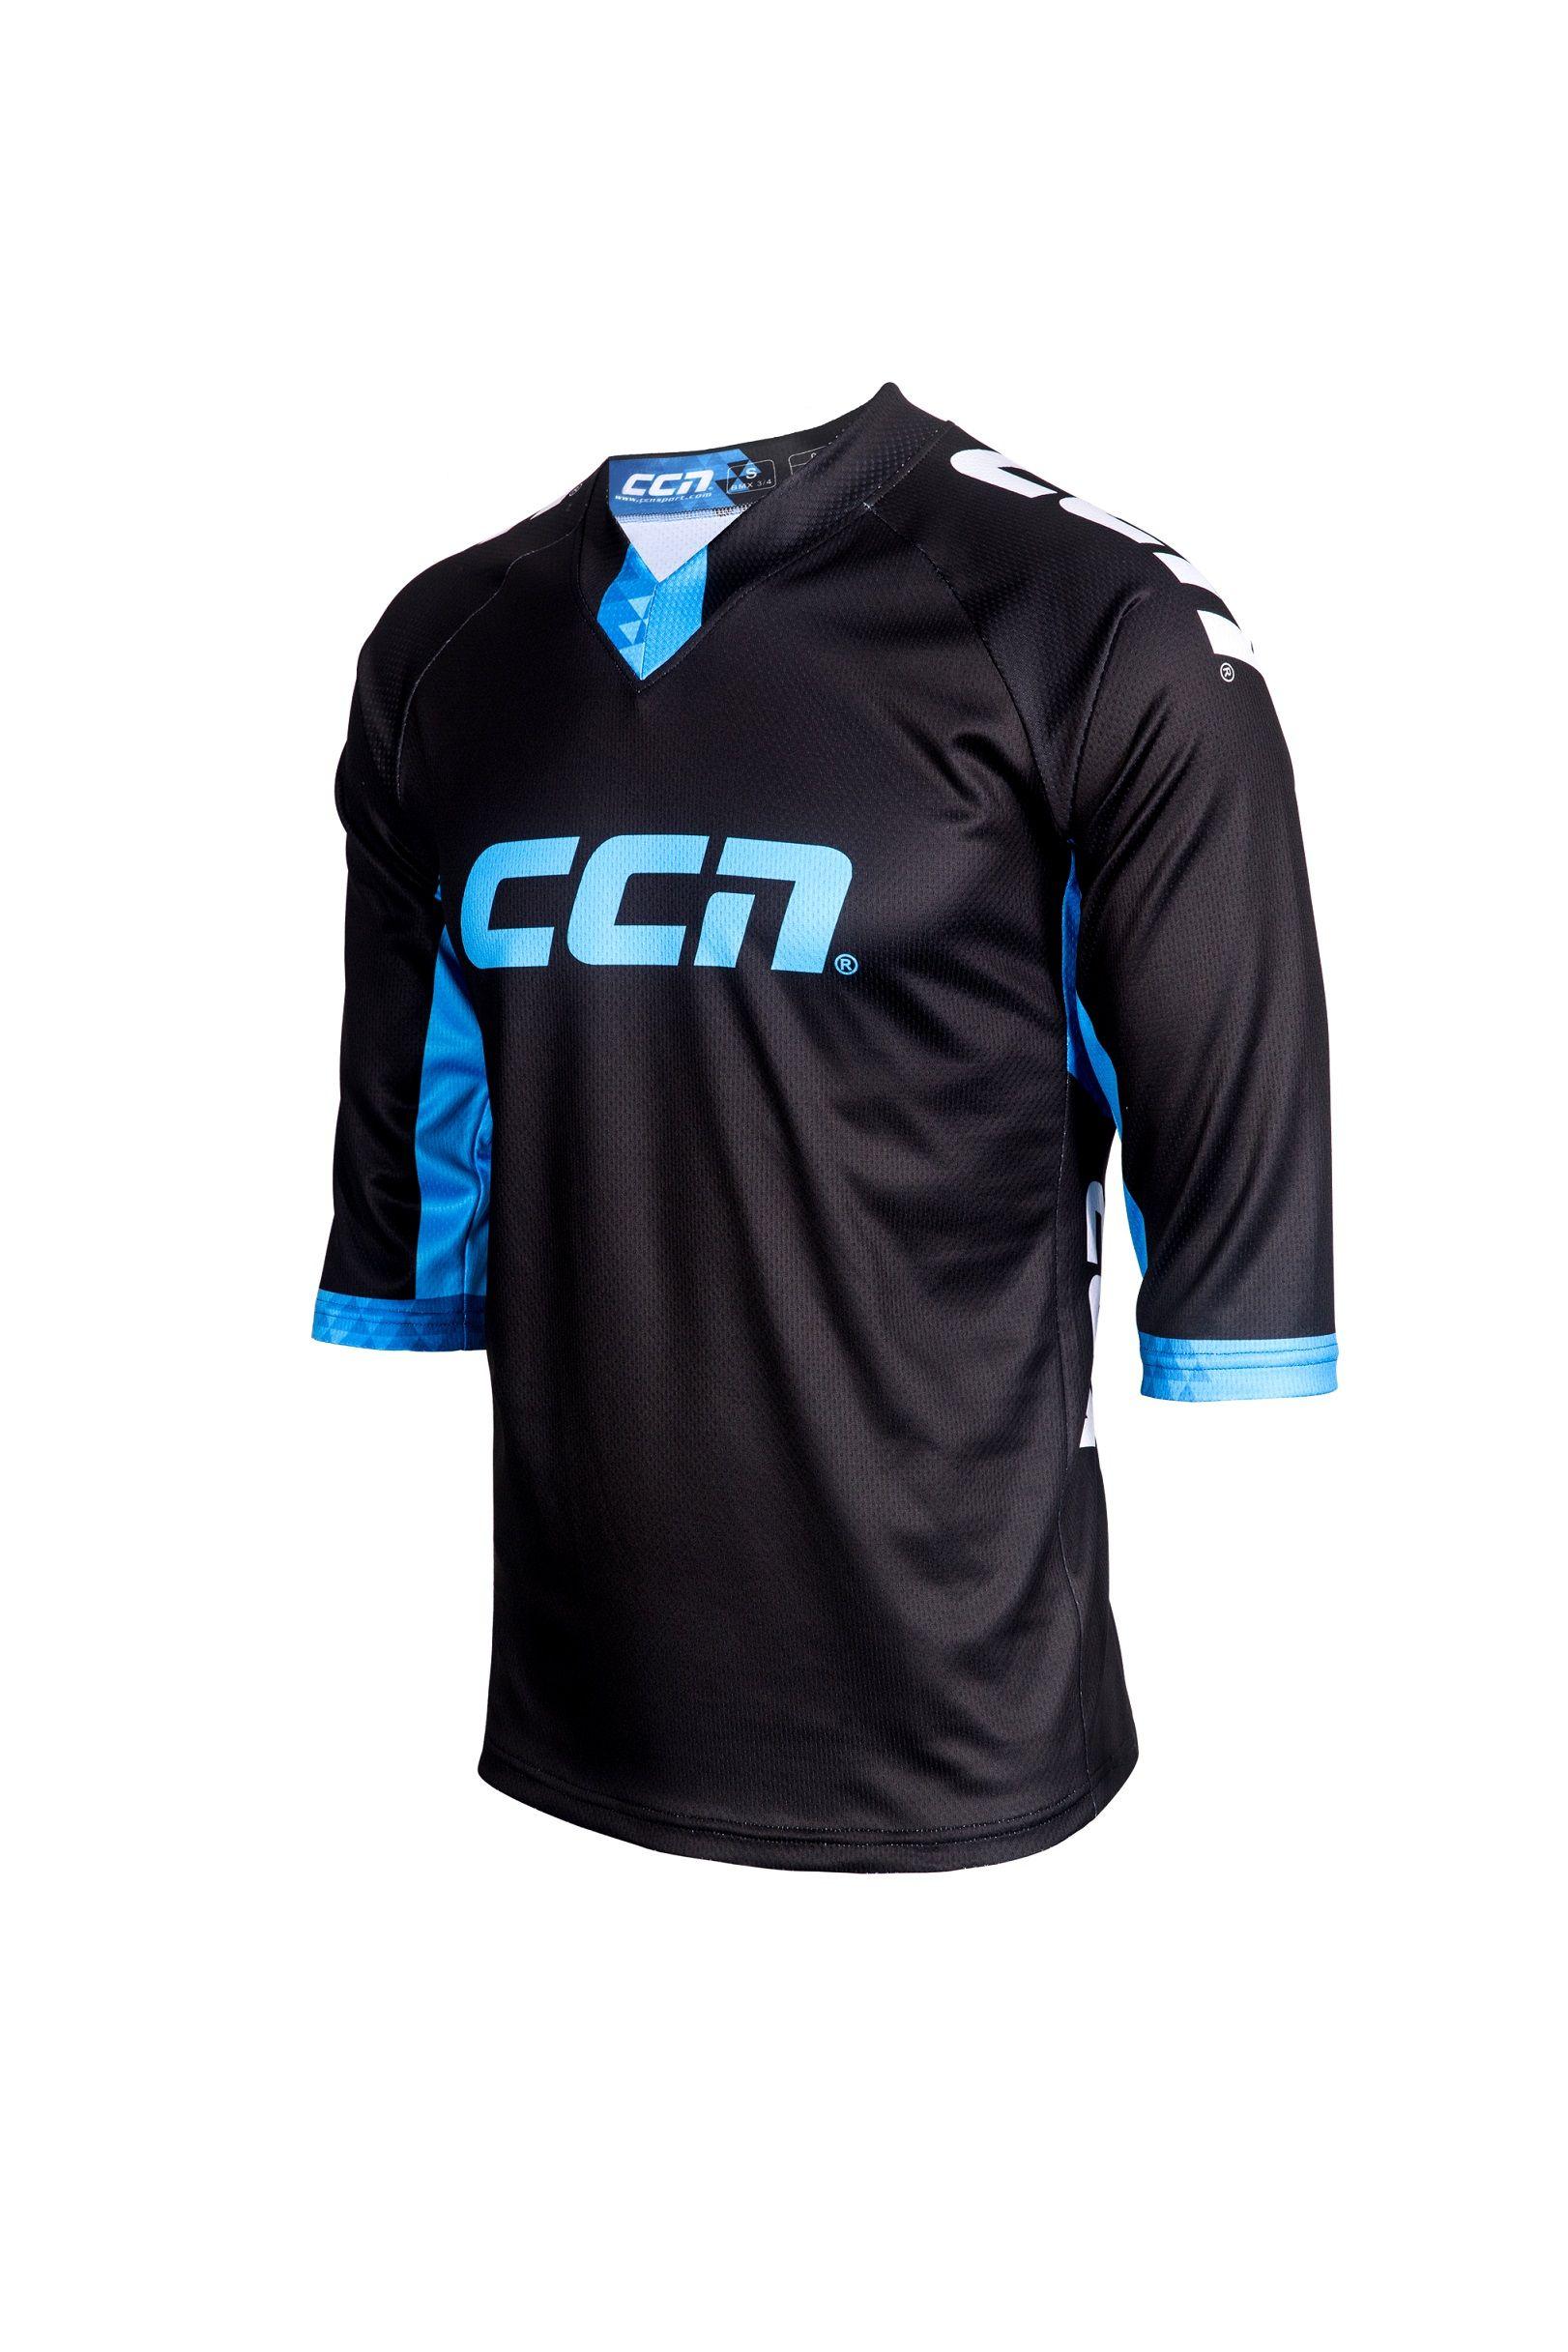 BMX DOWNHILL SHORT Triathlon clothing, Bmx, Sports